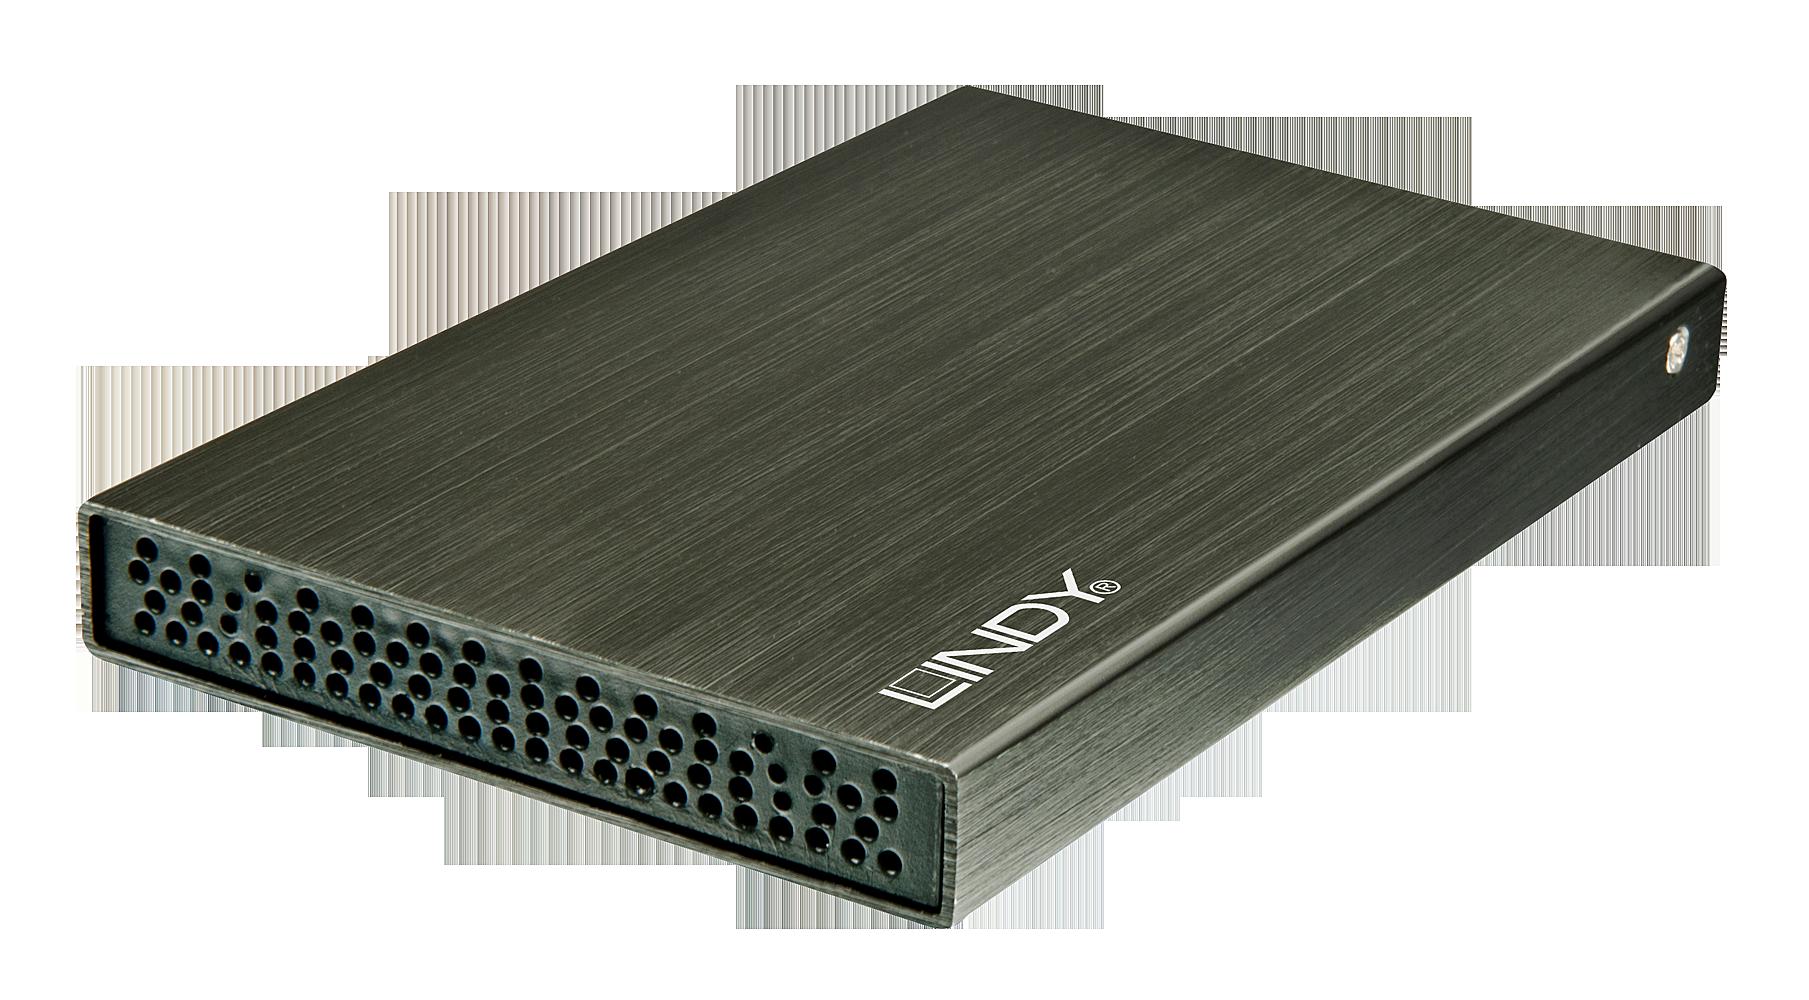 USB 2.0 SATA Gehäuse 2,5 Classic